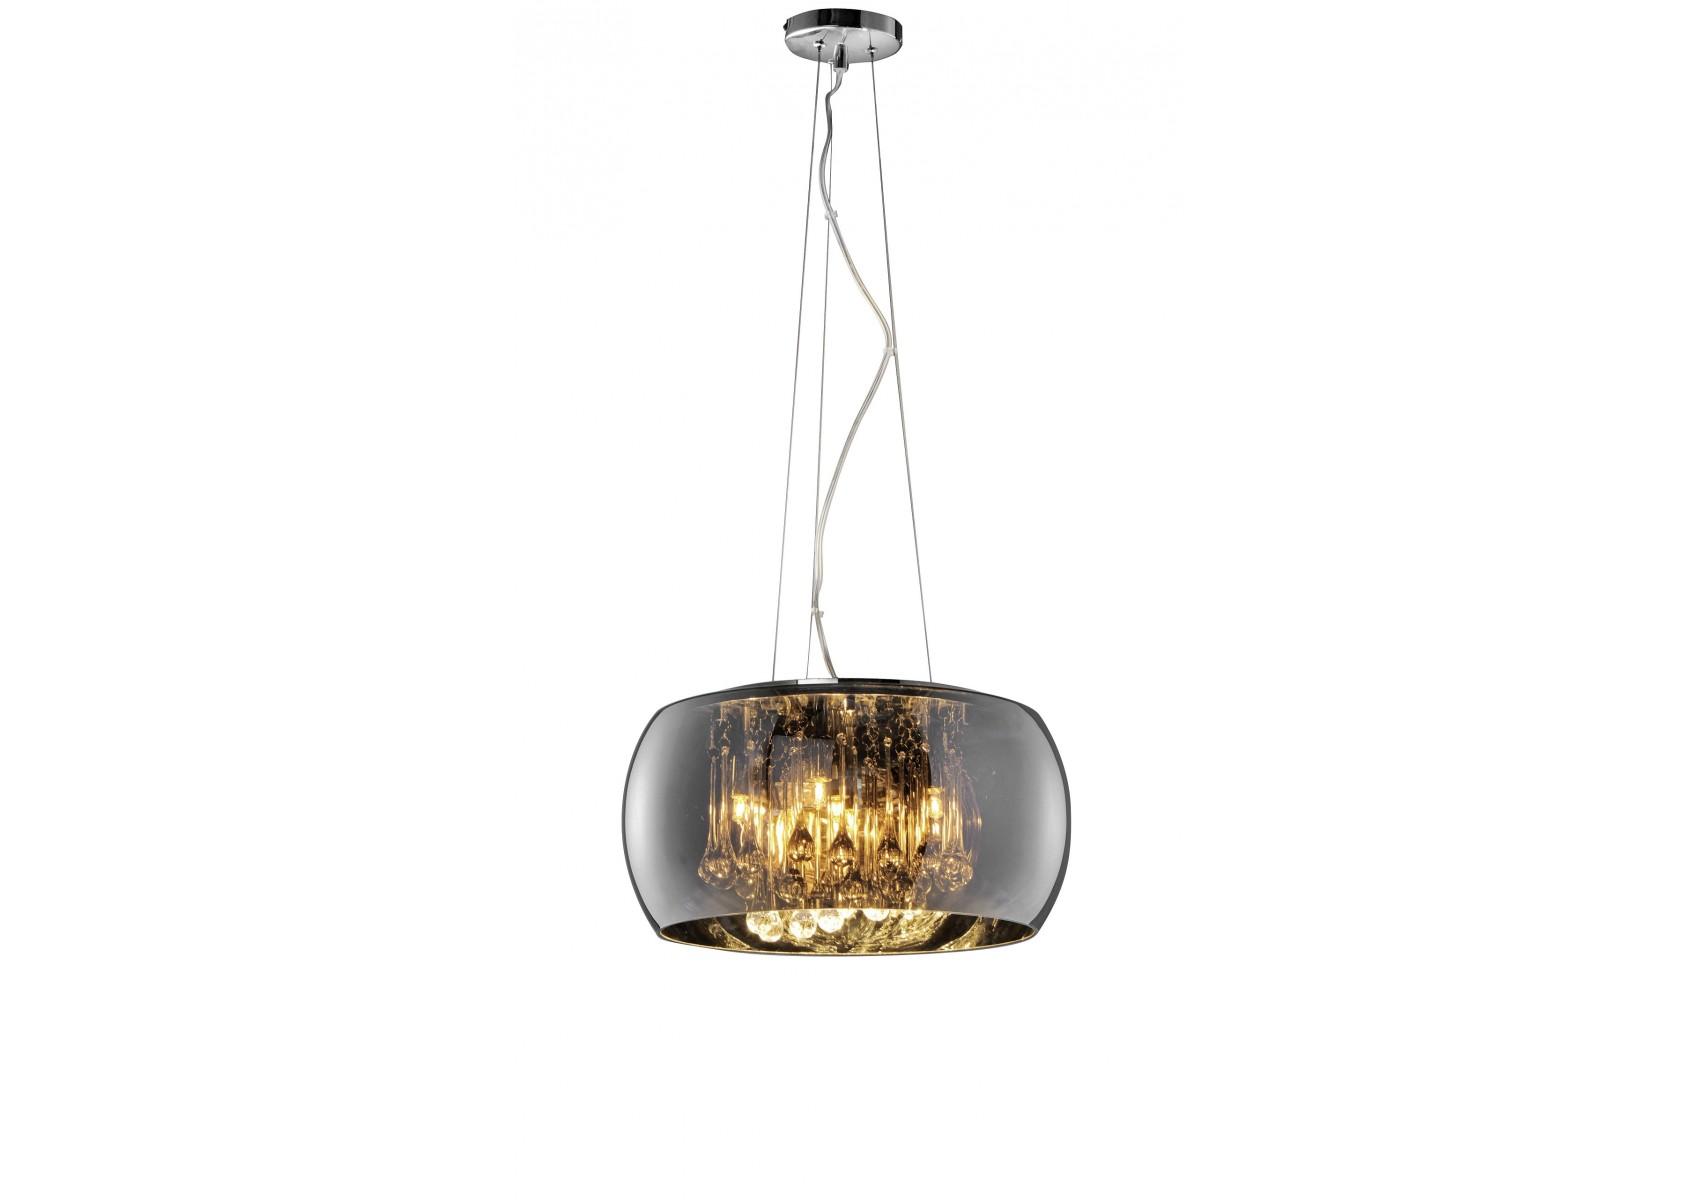 suspension design vapore en verre boite design. Black Bedroom Furniture Sets. Home Design Ideas